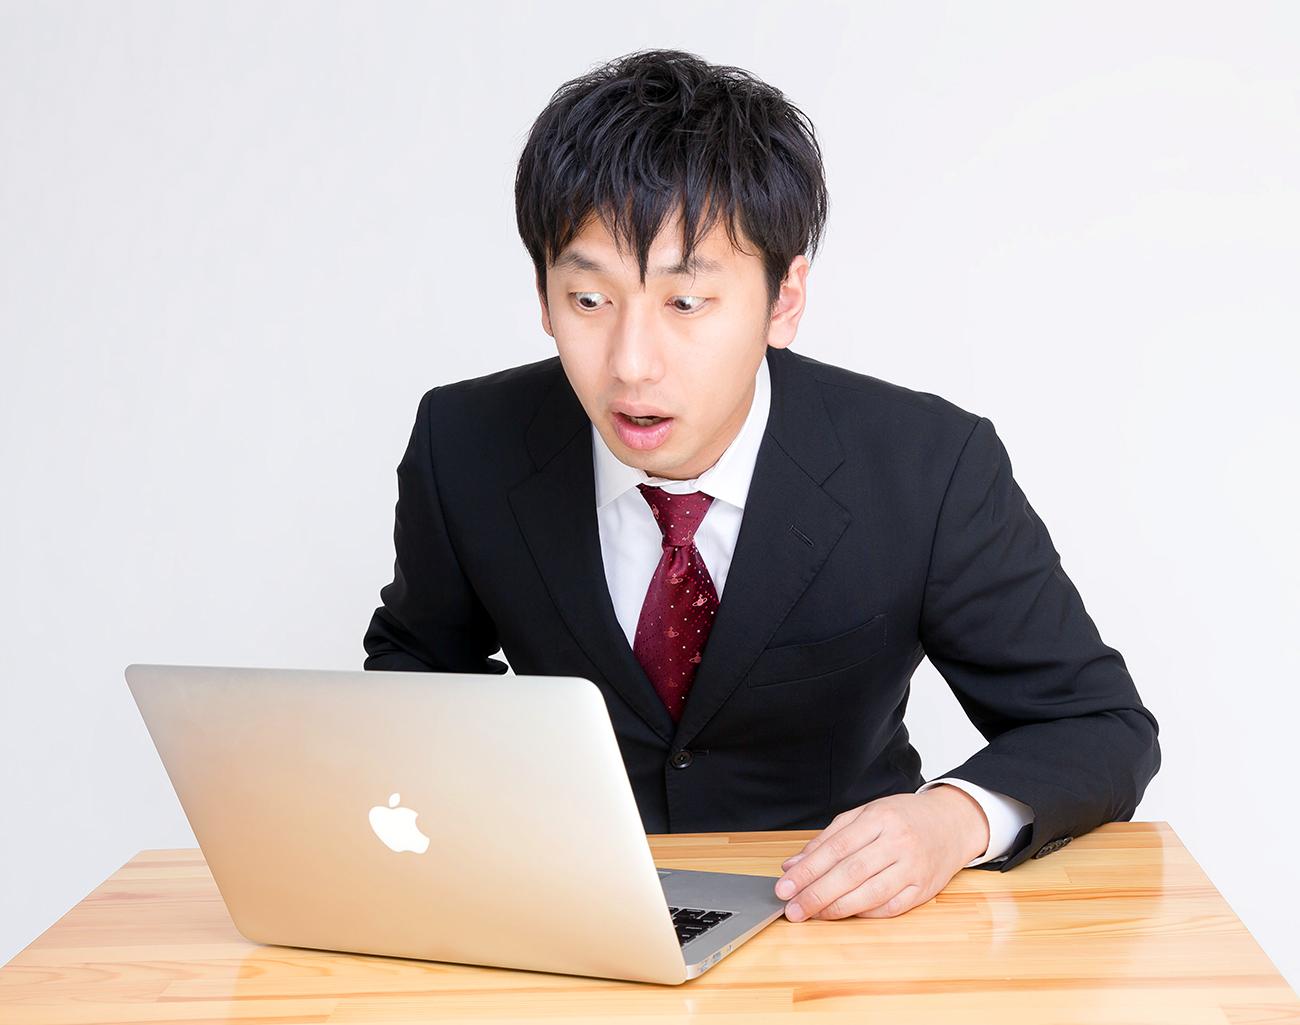 PCを見て驚く男性